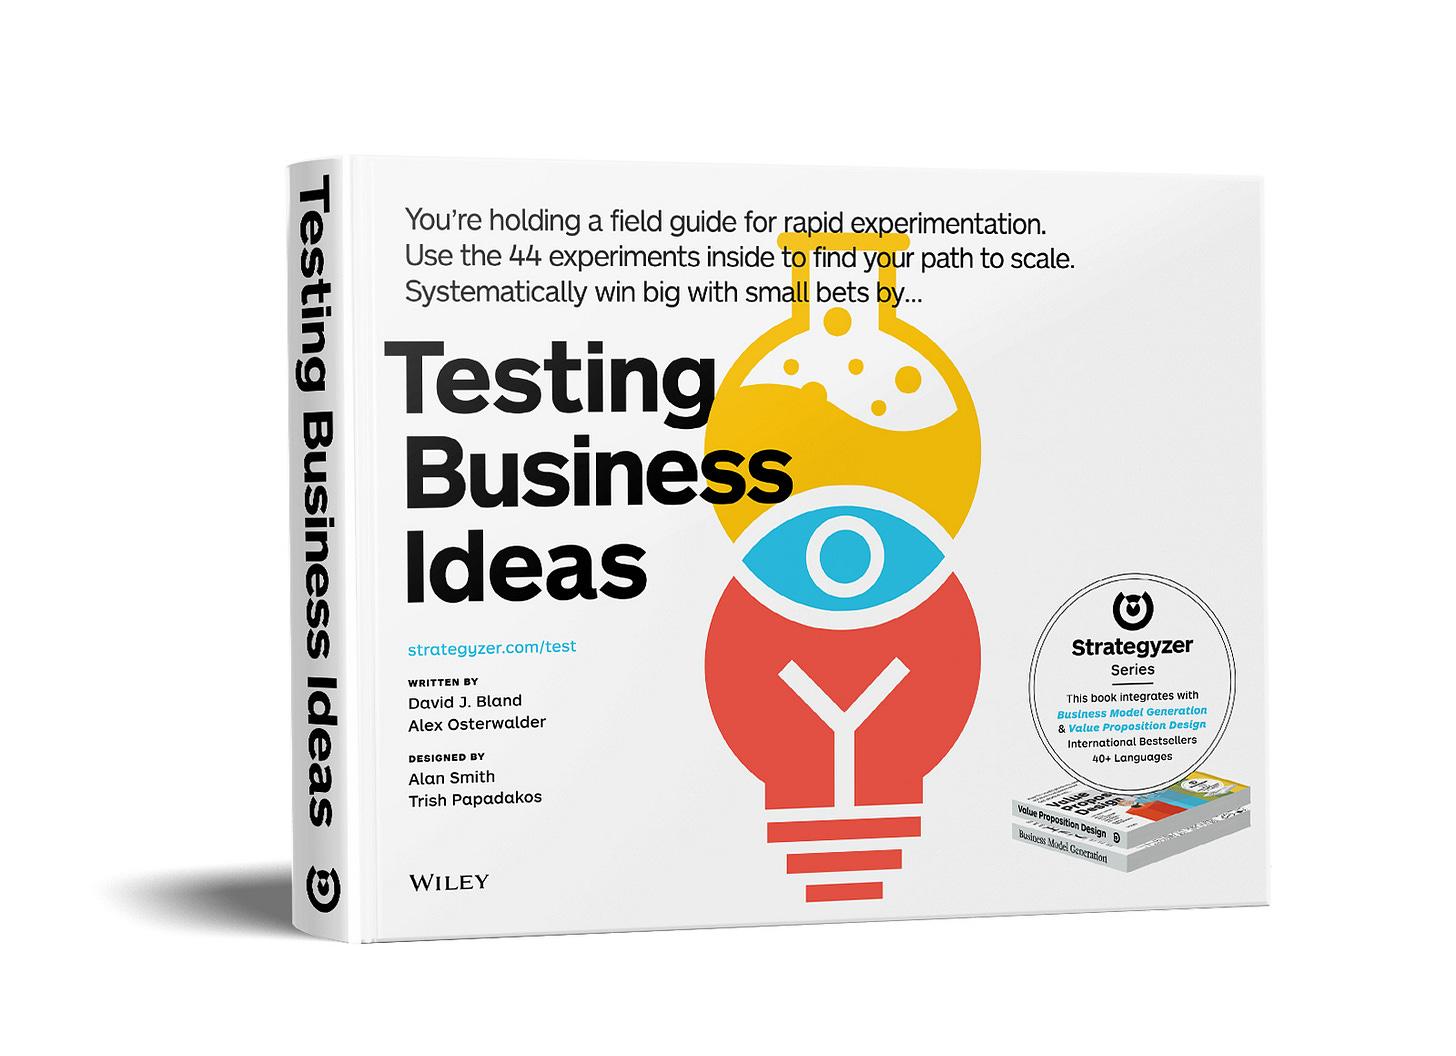 Testing business ideas | Imperial Enterprise Lab